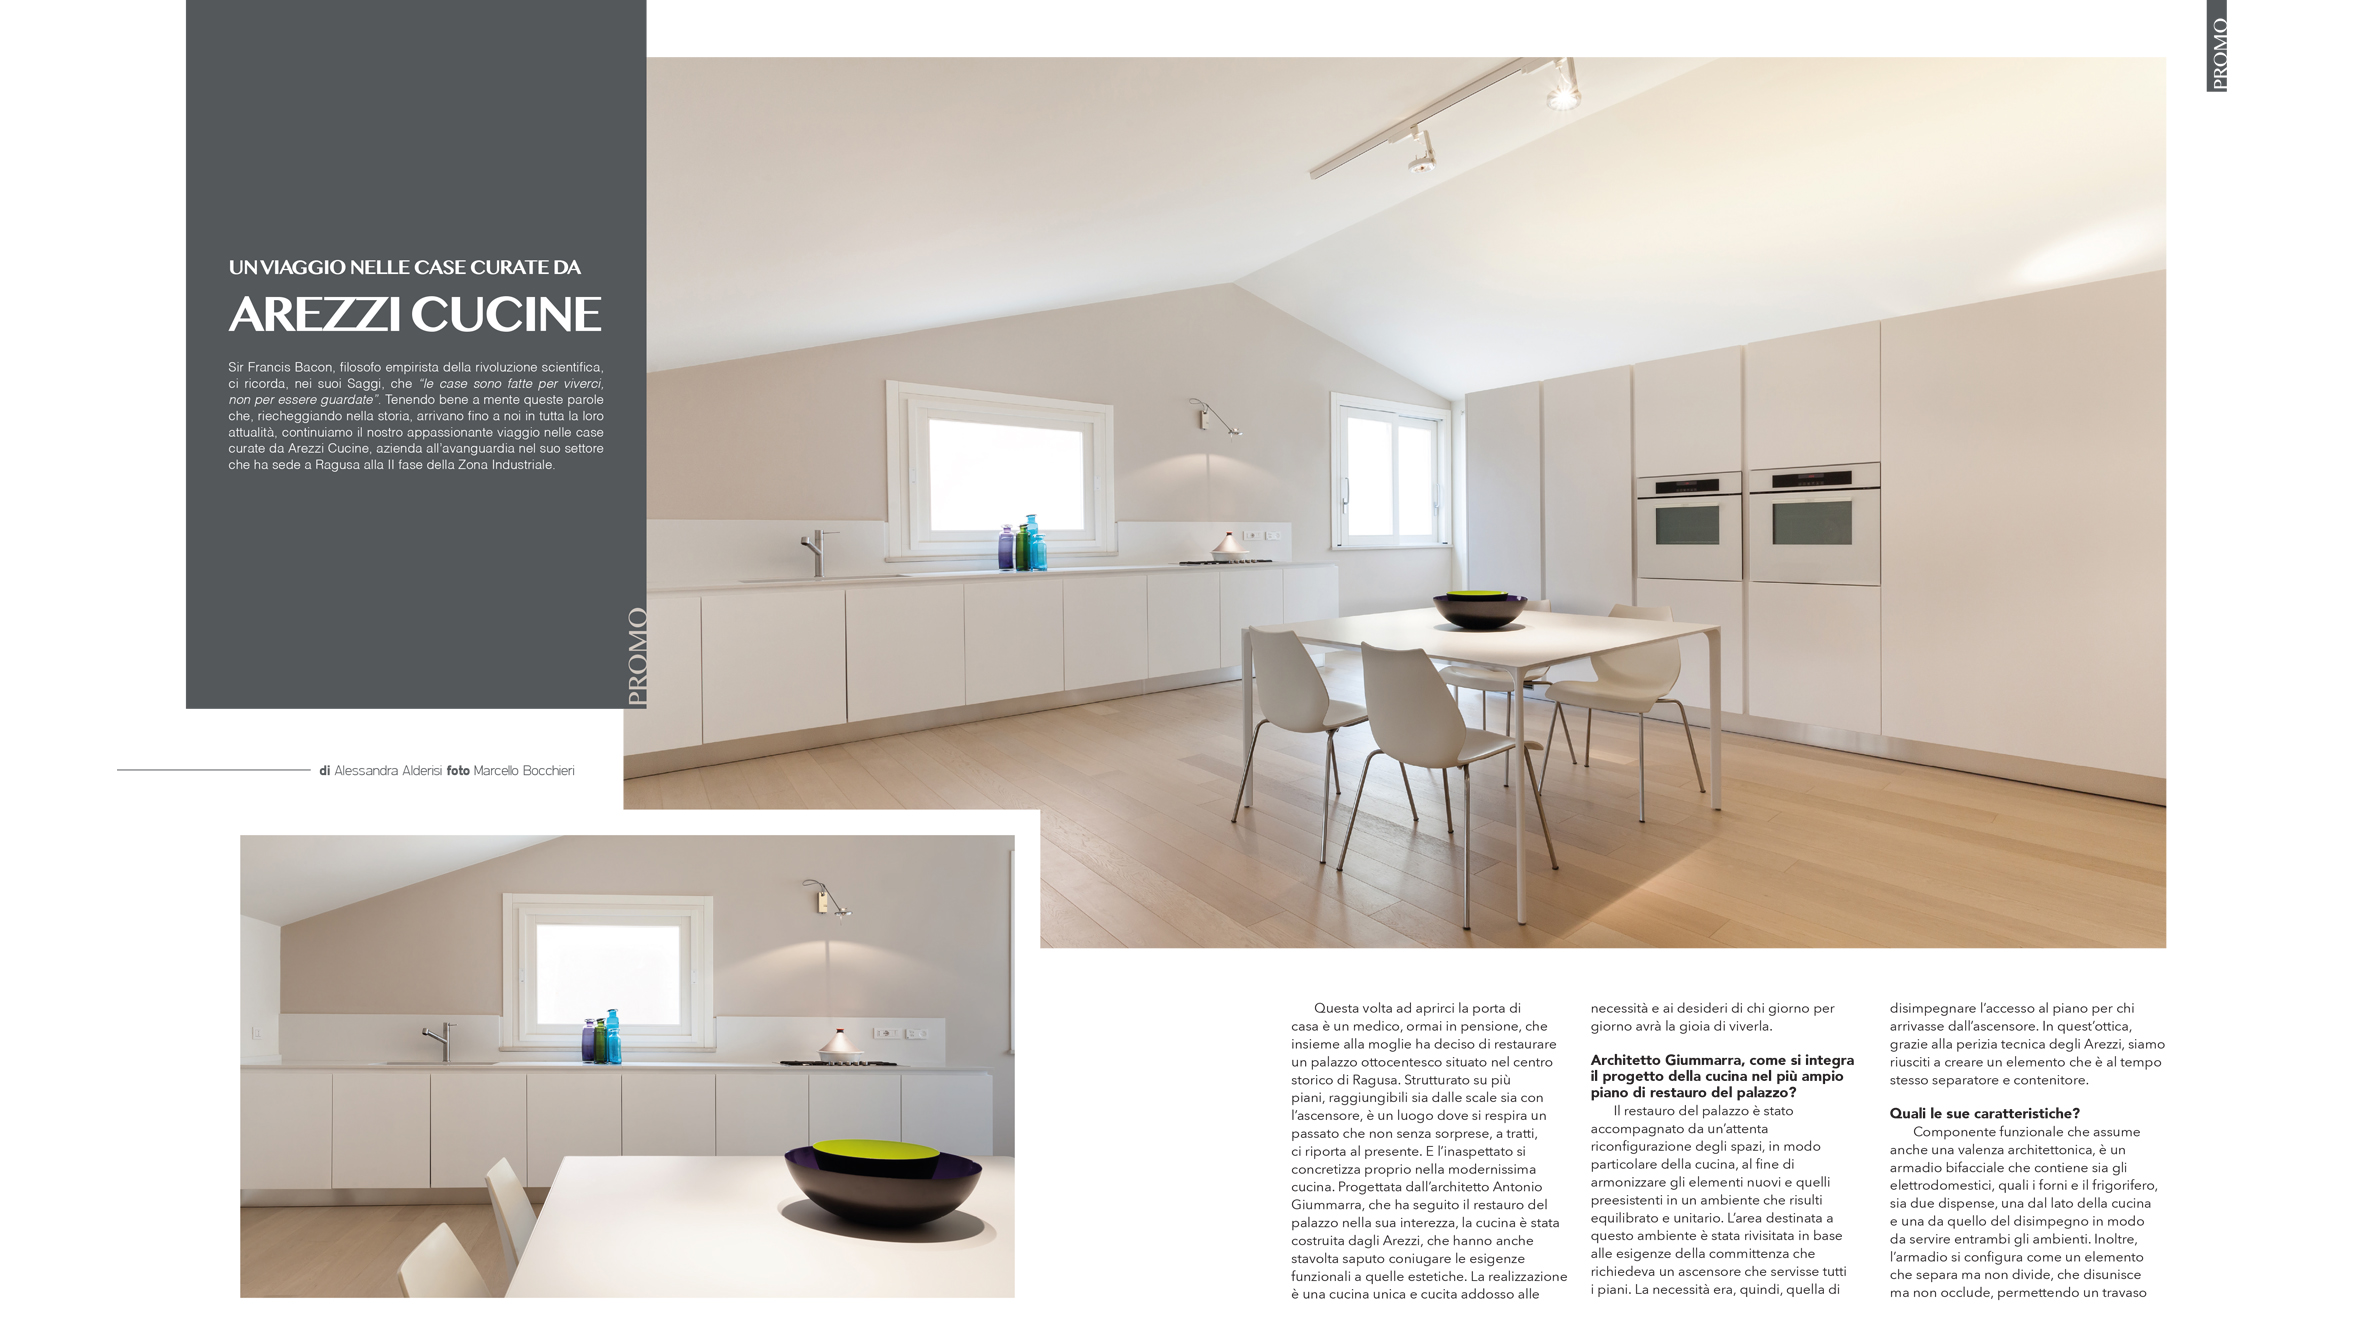 Stunning Arezzi Cucine Ragusa Pictures - Design & Ideas 2017 - candp.us